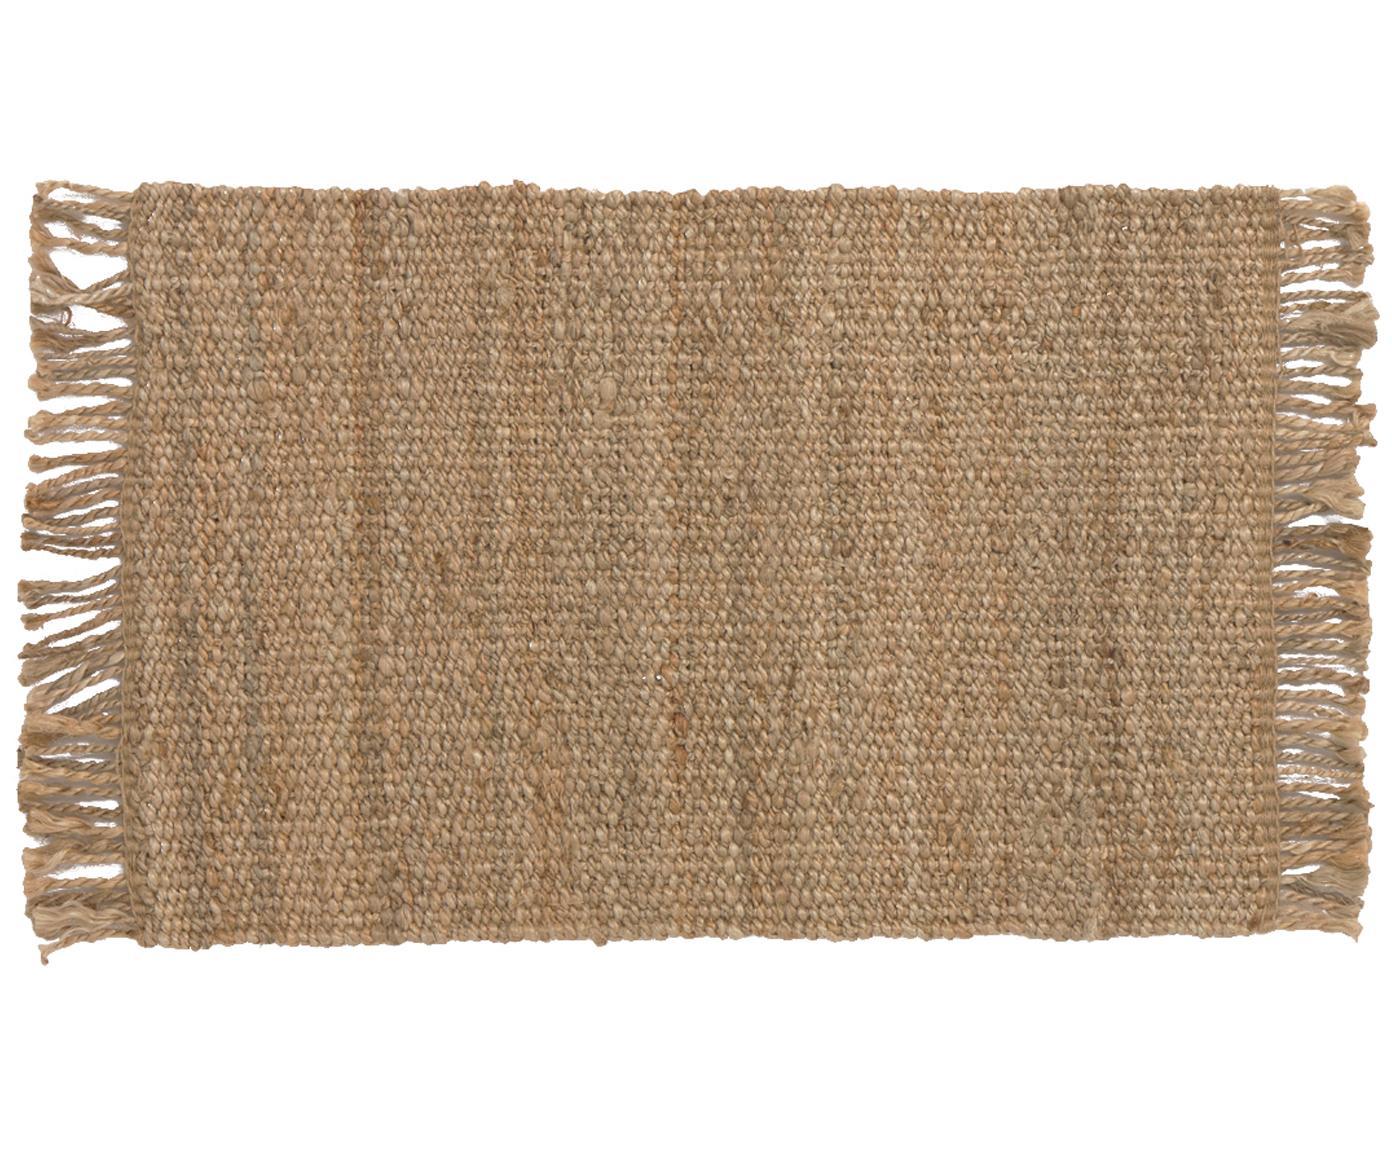 Tappeto in juta taftato a mano Cadiz, Juta, Juta, Larg. 60 x Lung. 90 cm (taglia XXS)